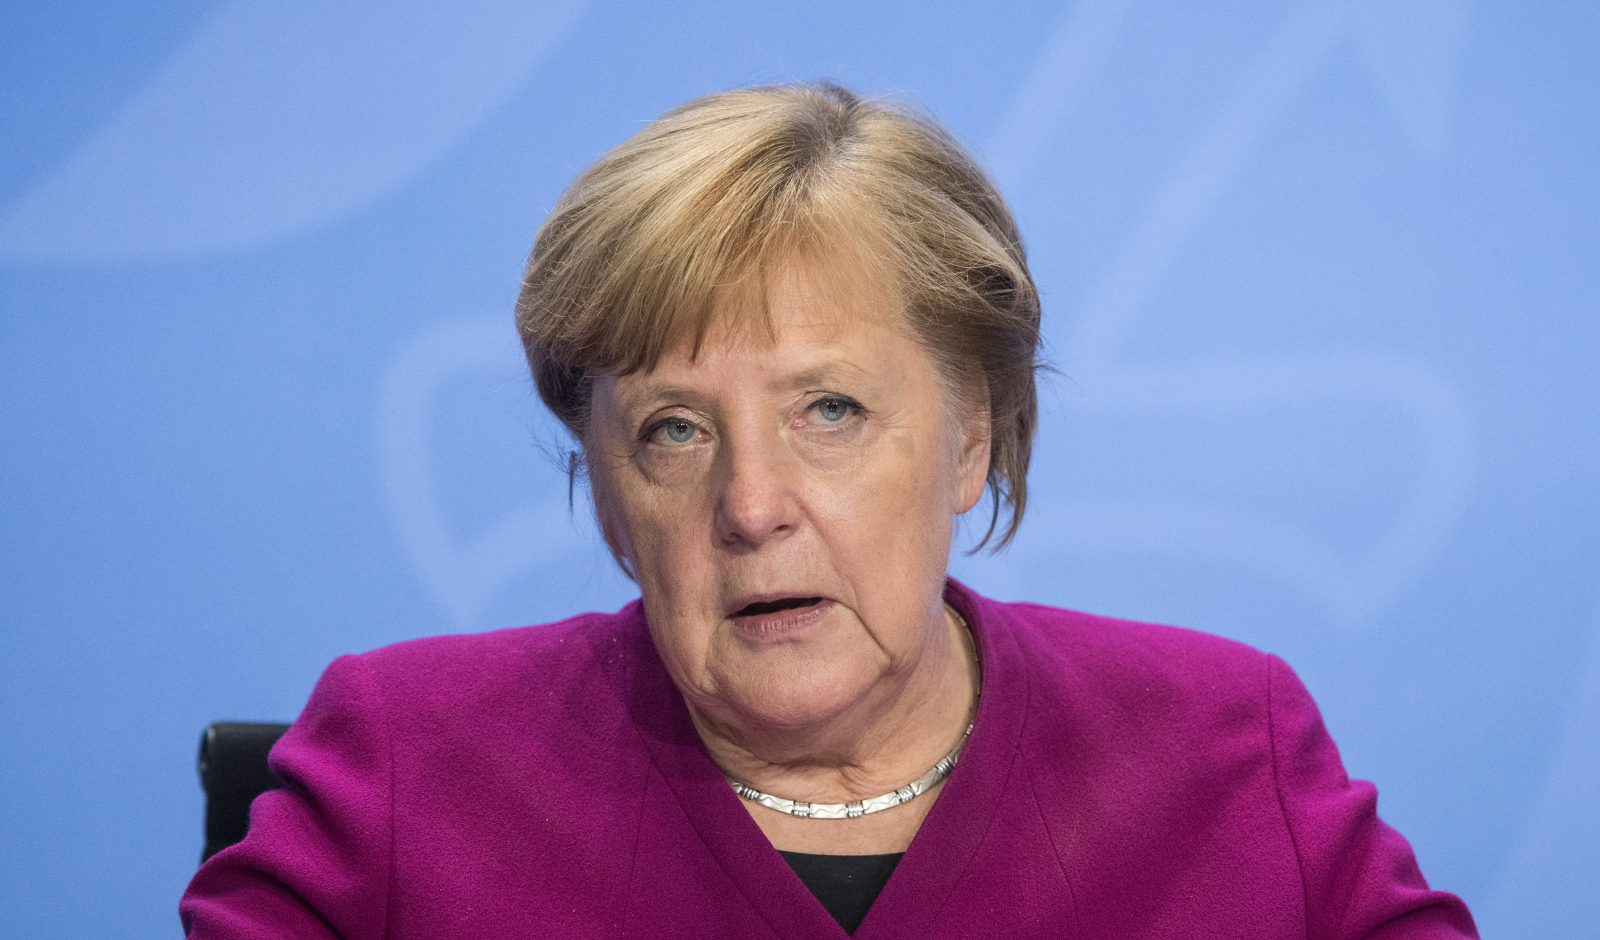 Bundeskanzlerin Angela Merkel (CDU) hätte sich strengere Corona-Regeln gewünscht Foto: picture alliance/Stefanie Loos/AFP POOL/dpa